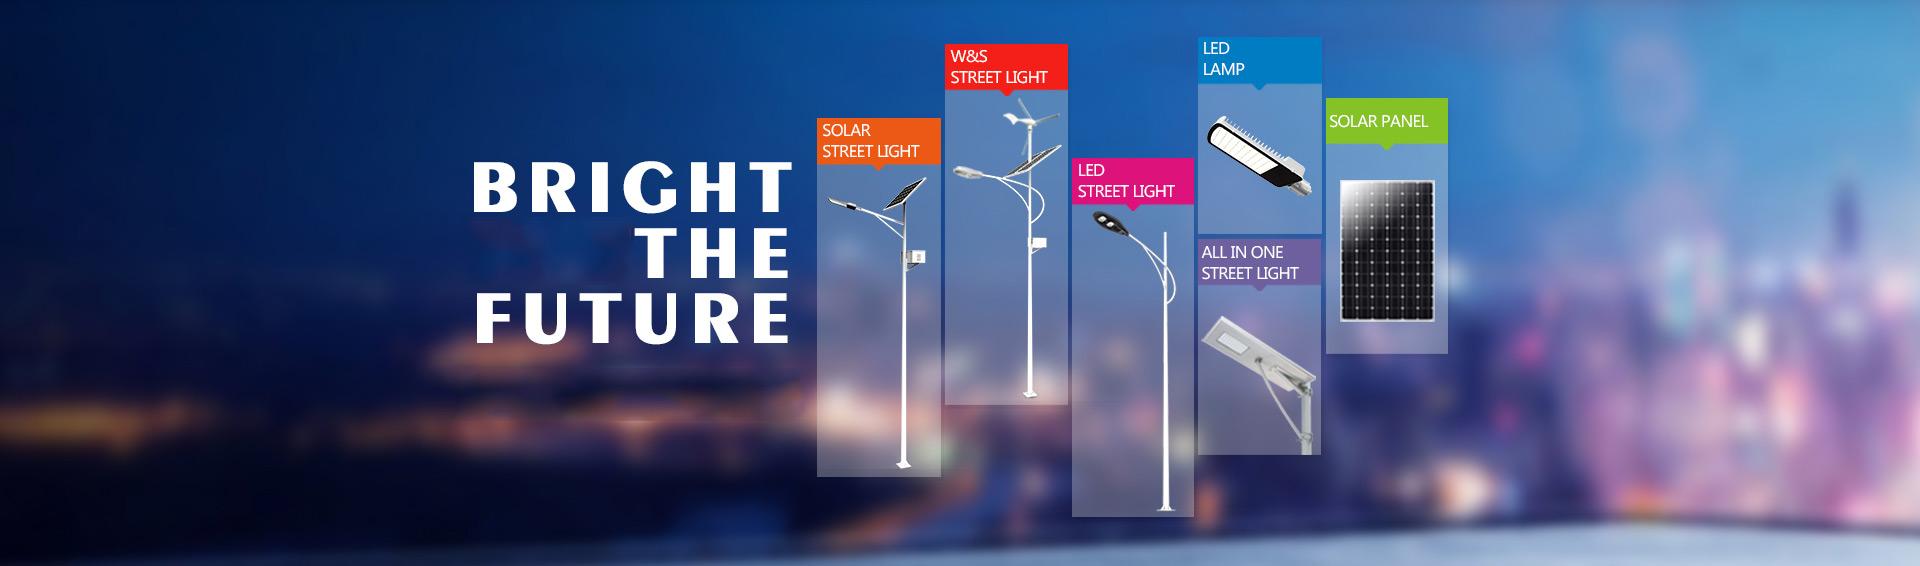 Solar street light prices